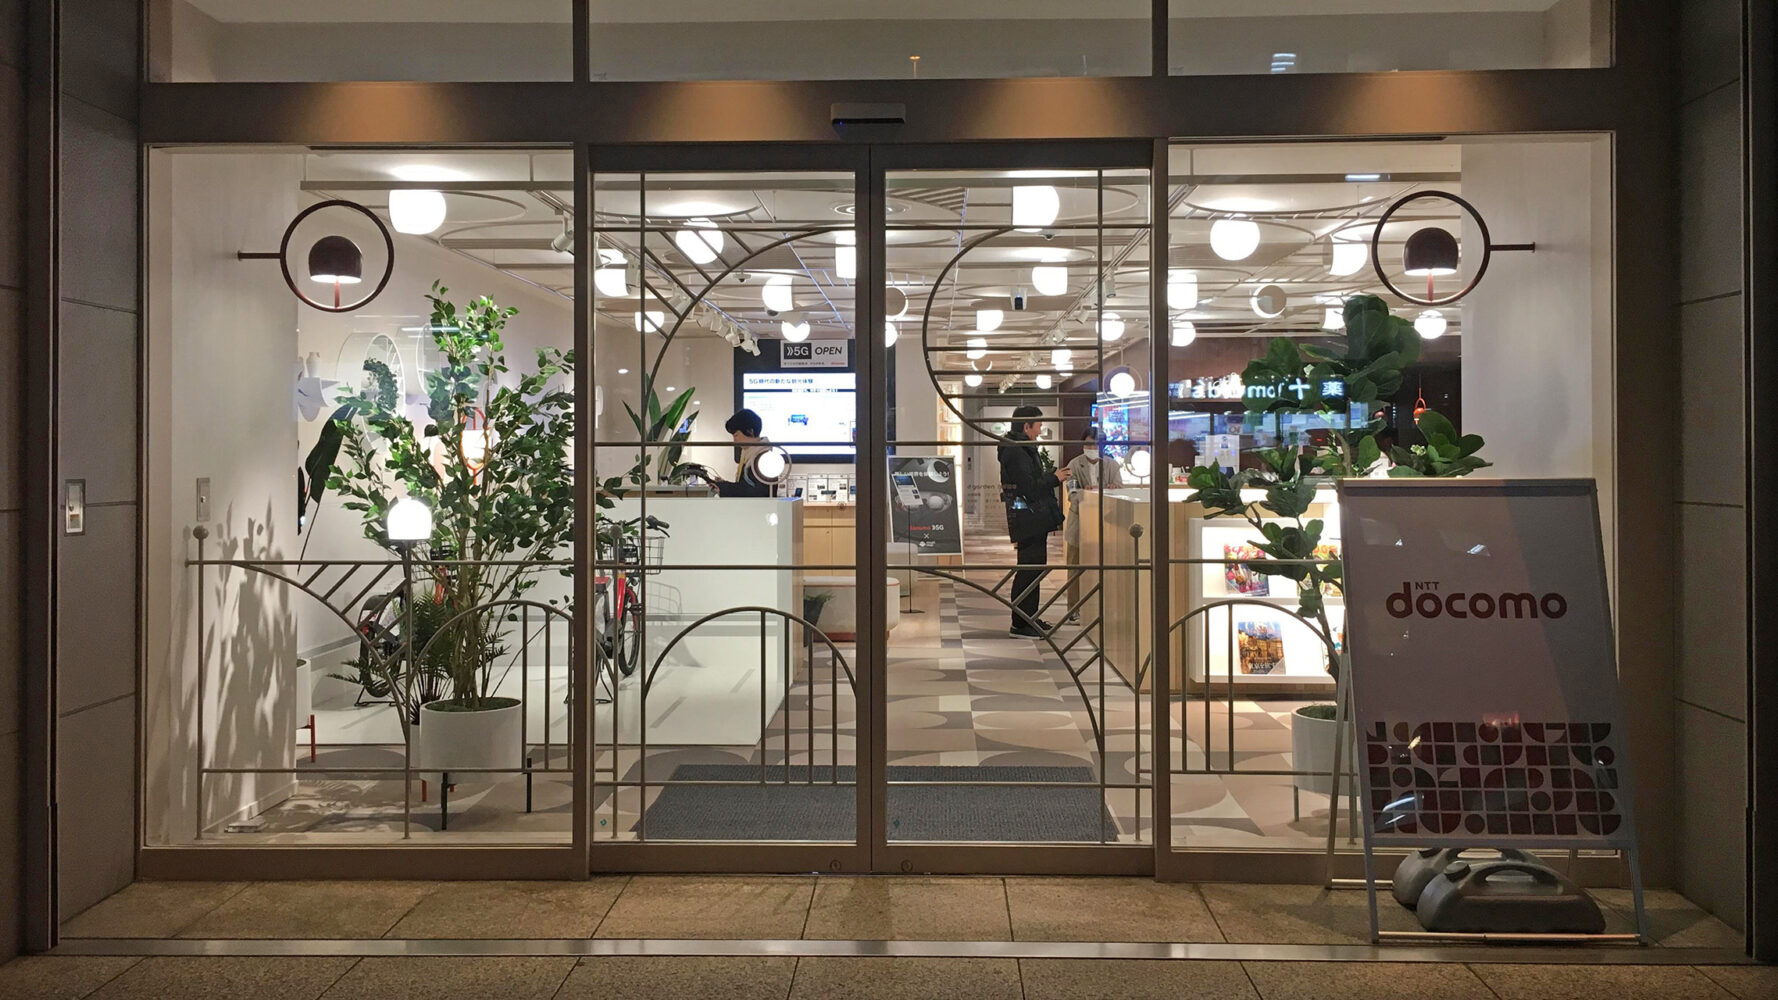 d garden 五反田店 事例画像1